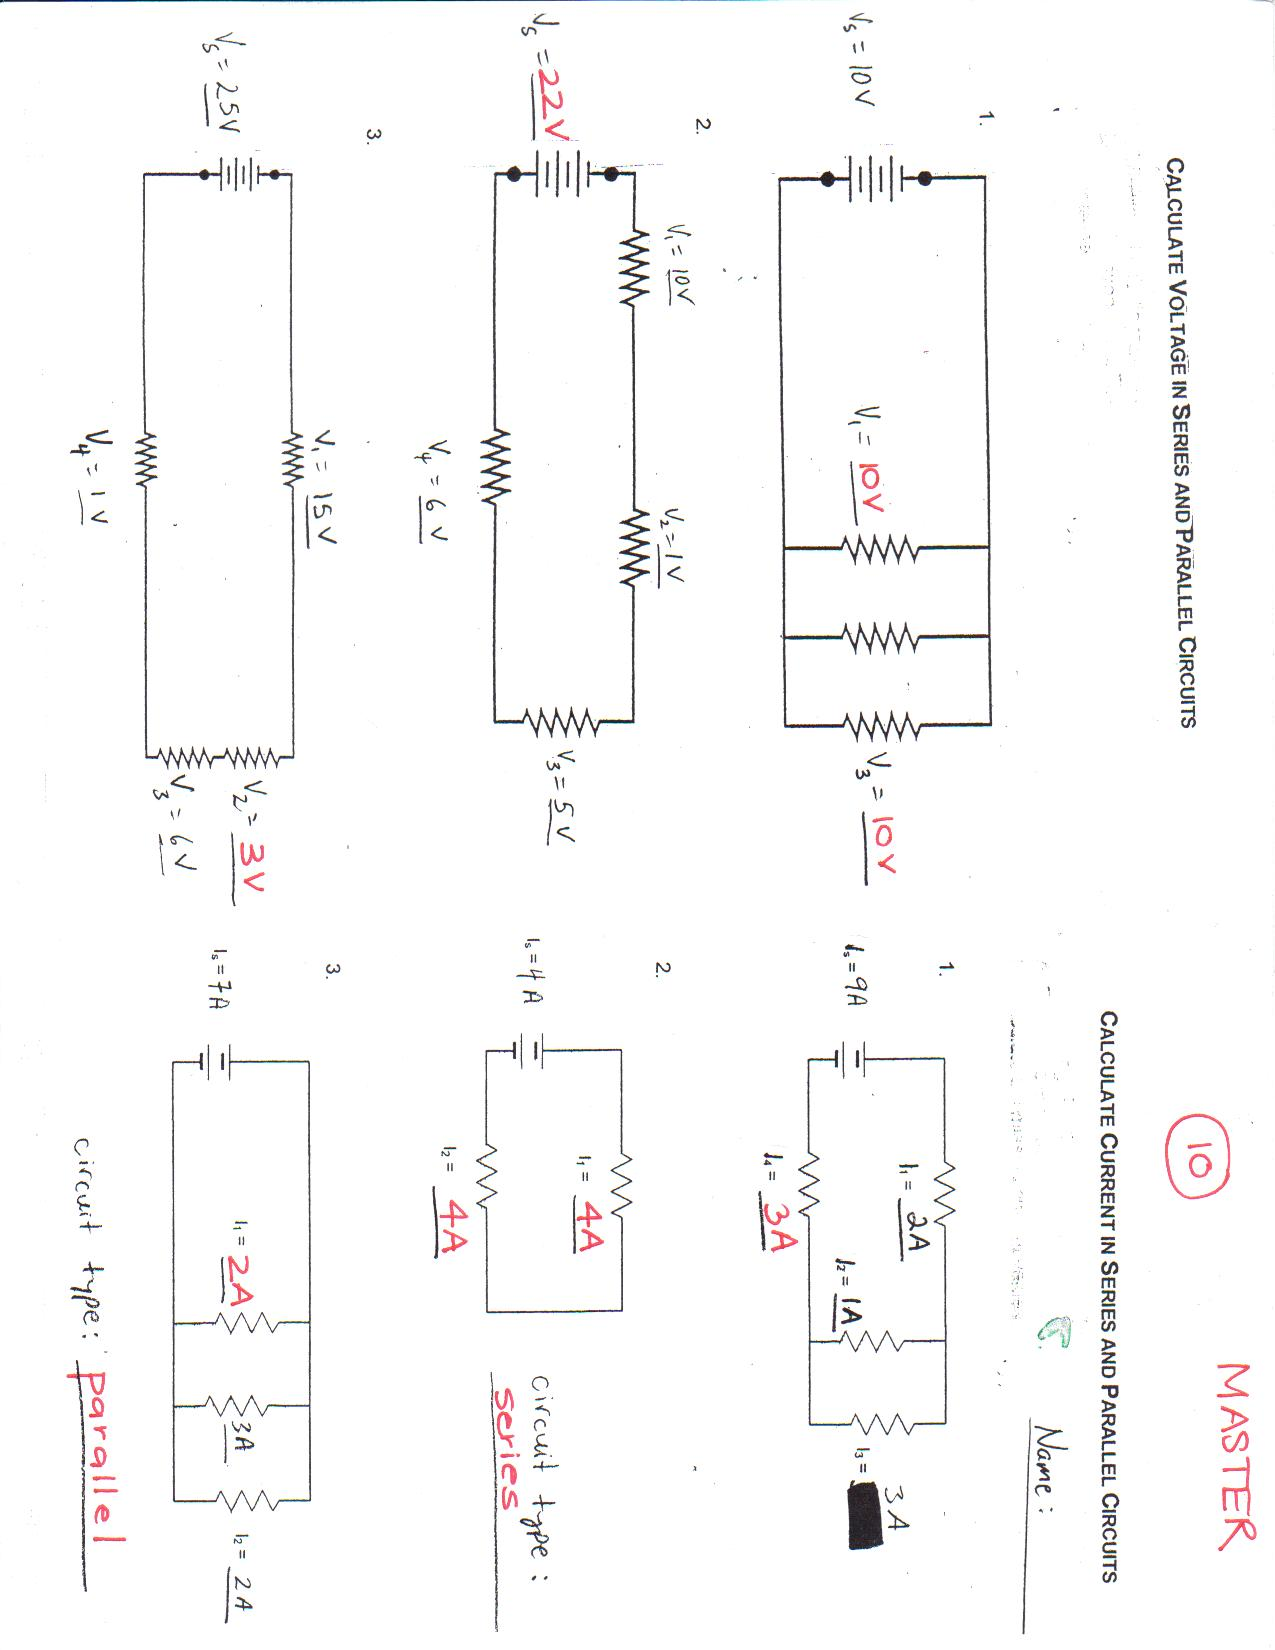 Schematic Symbols Chart Answers Pltw Gateway